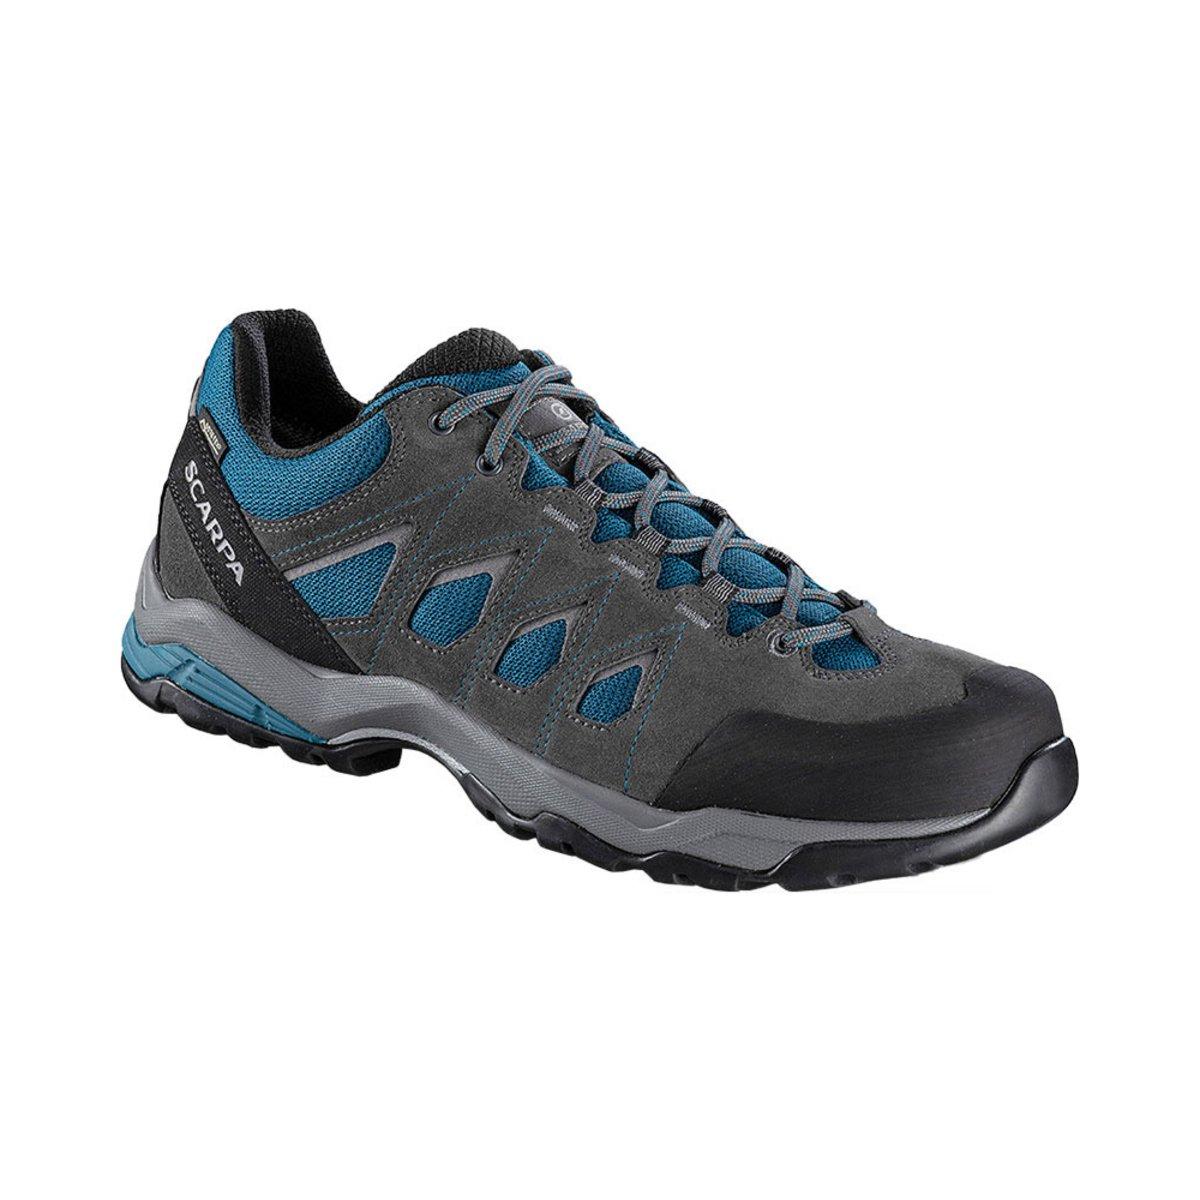 Scarpa Men's Moraine GORE-TEX Walking Shoes 0